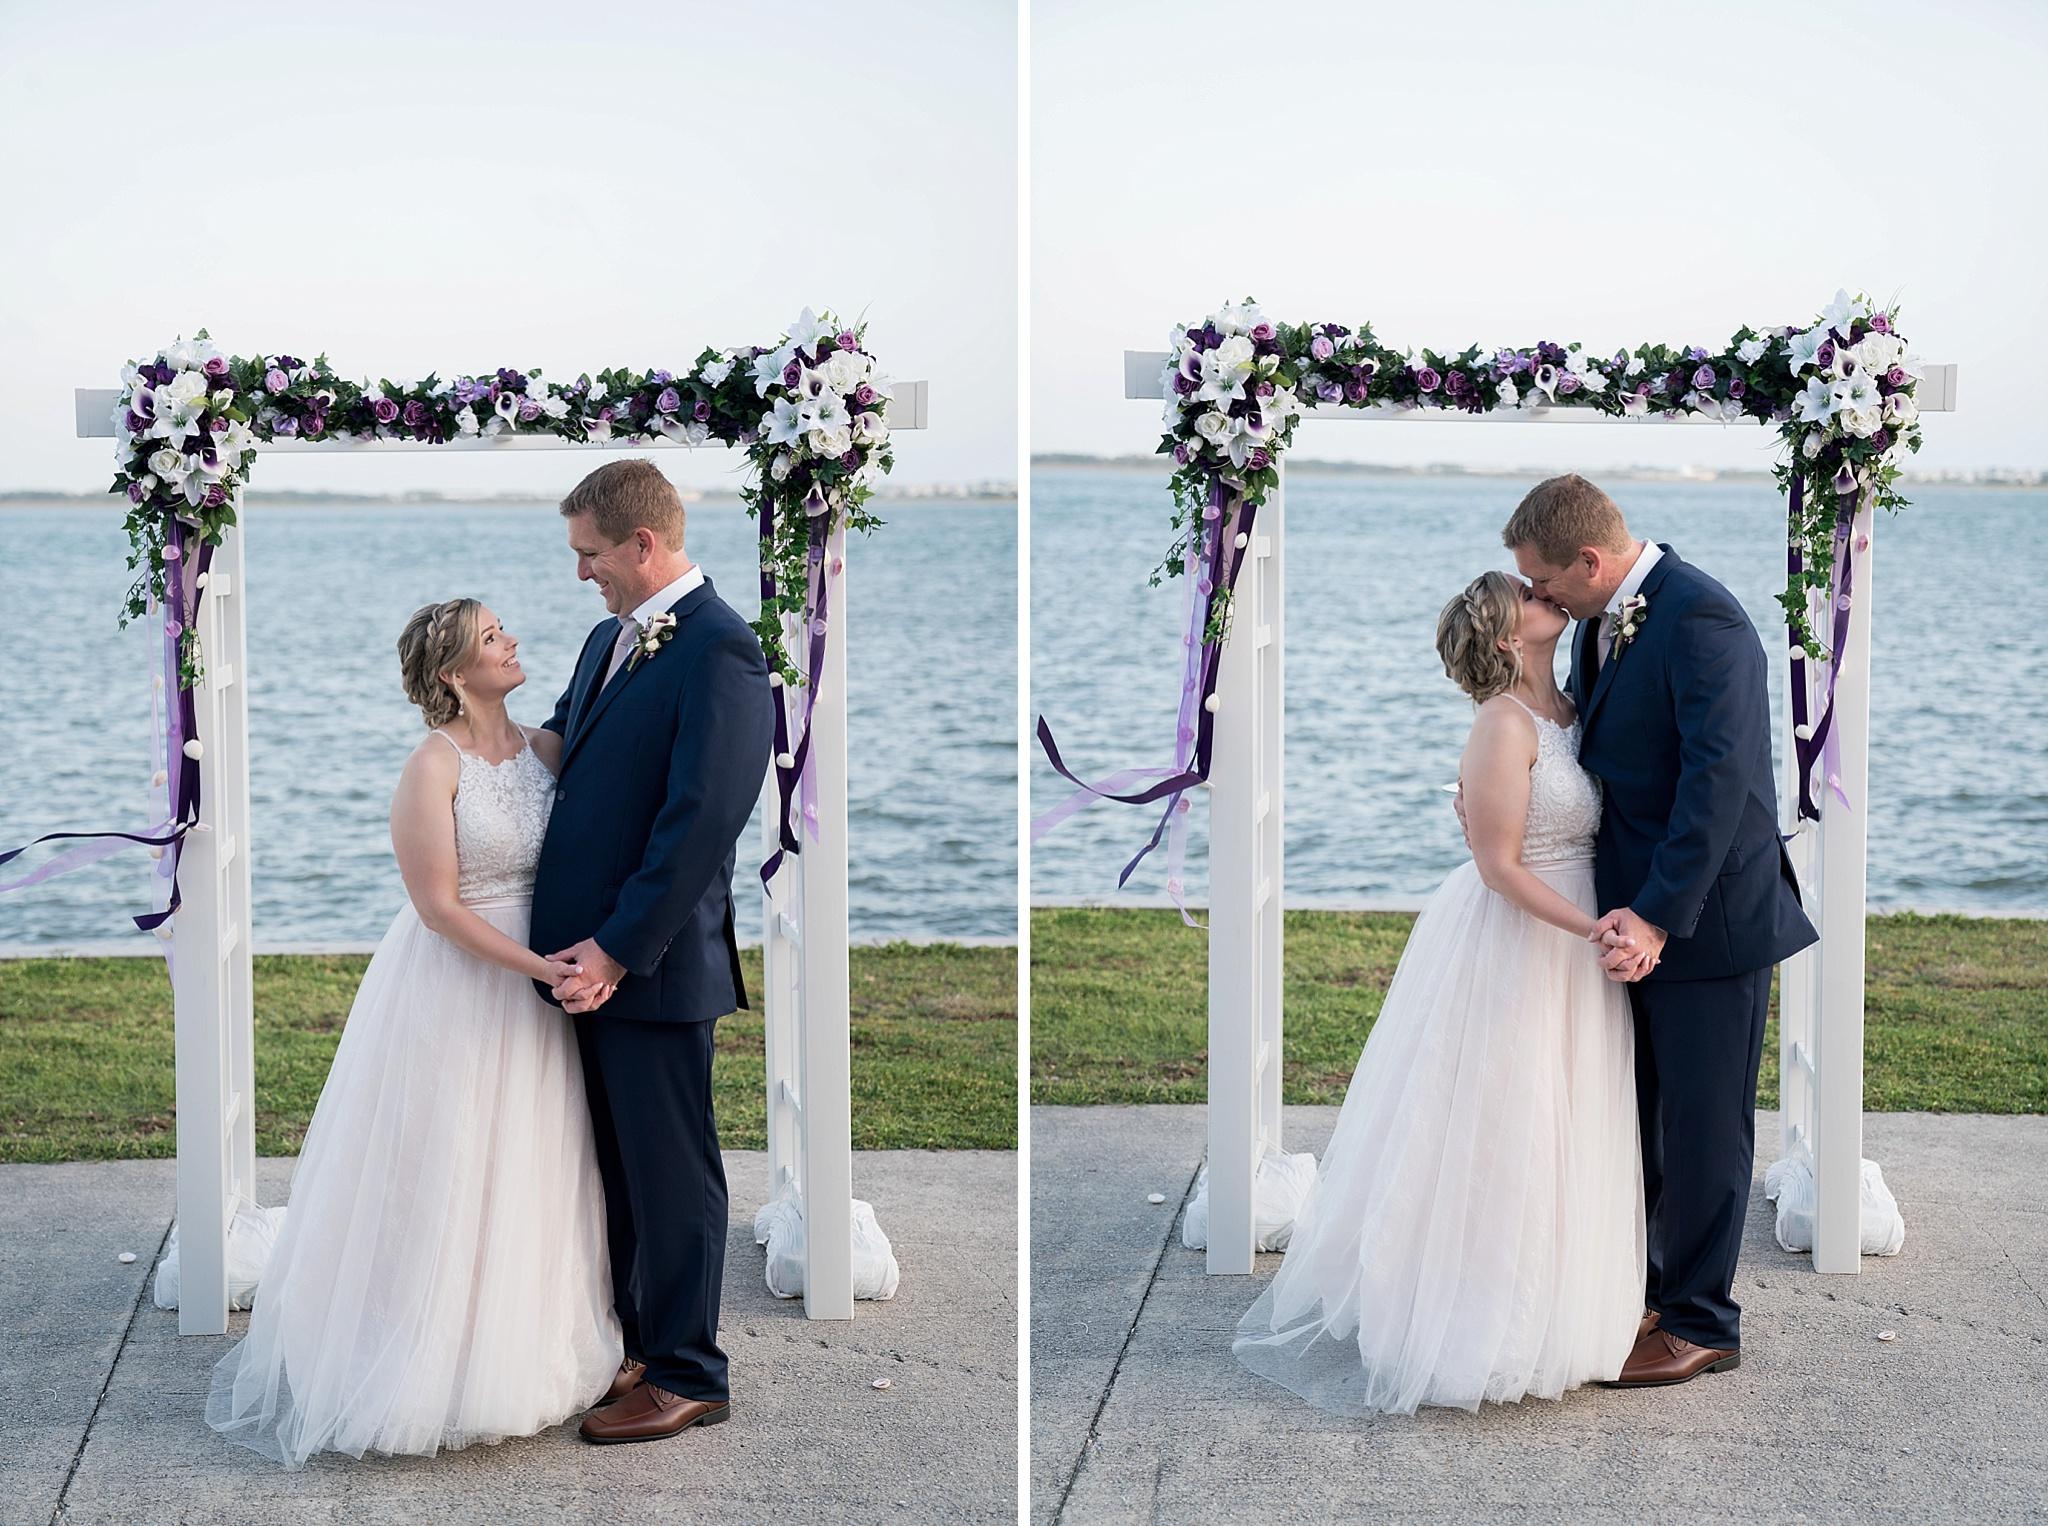 Crystal-Coast-Wedding-Photographer-051.jpg